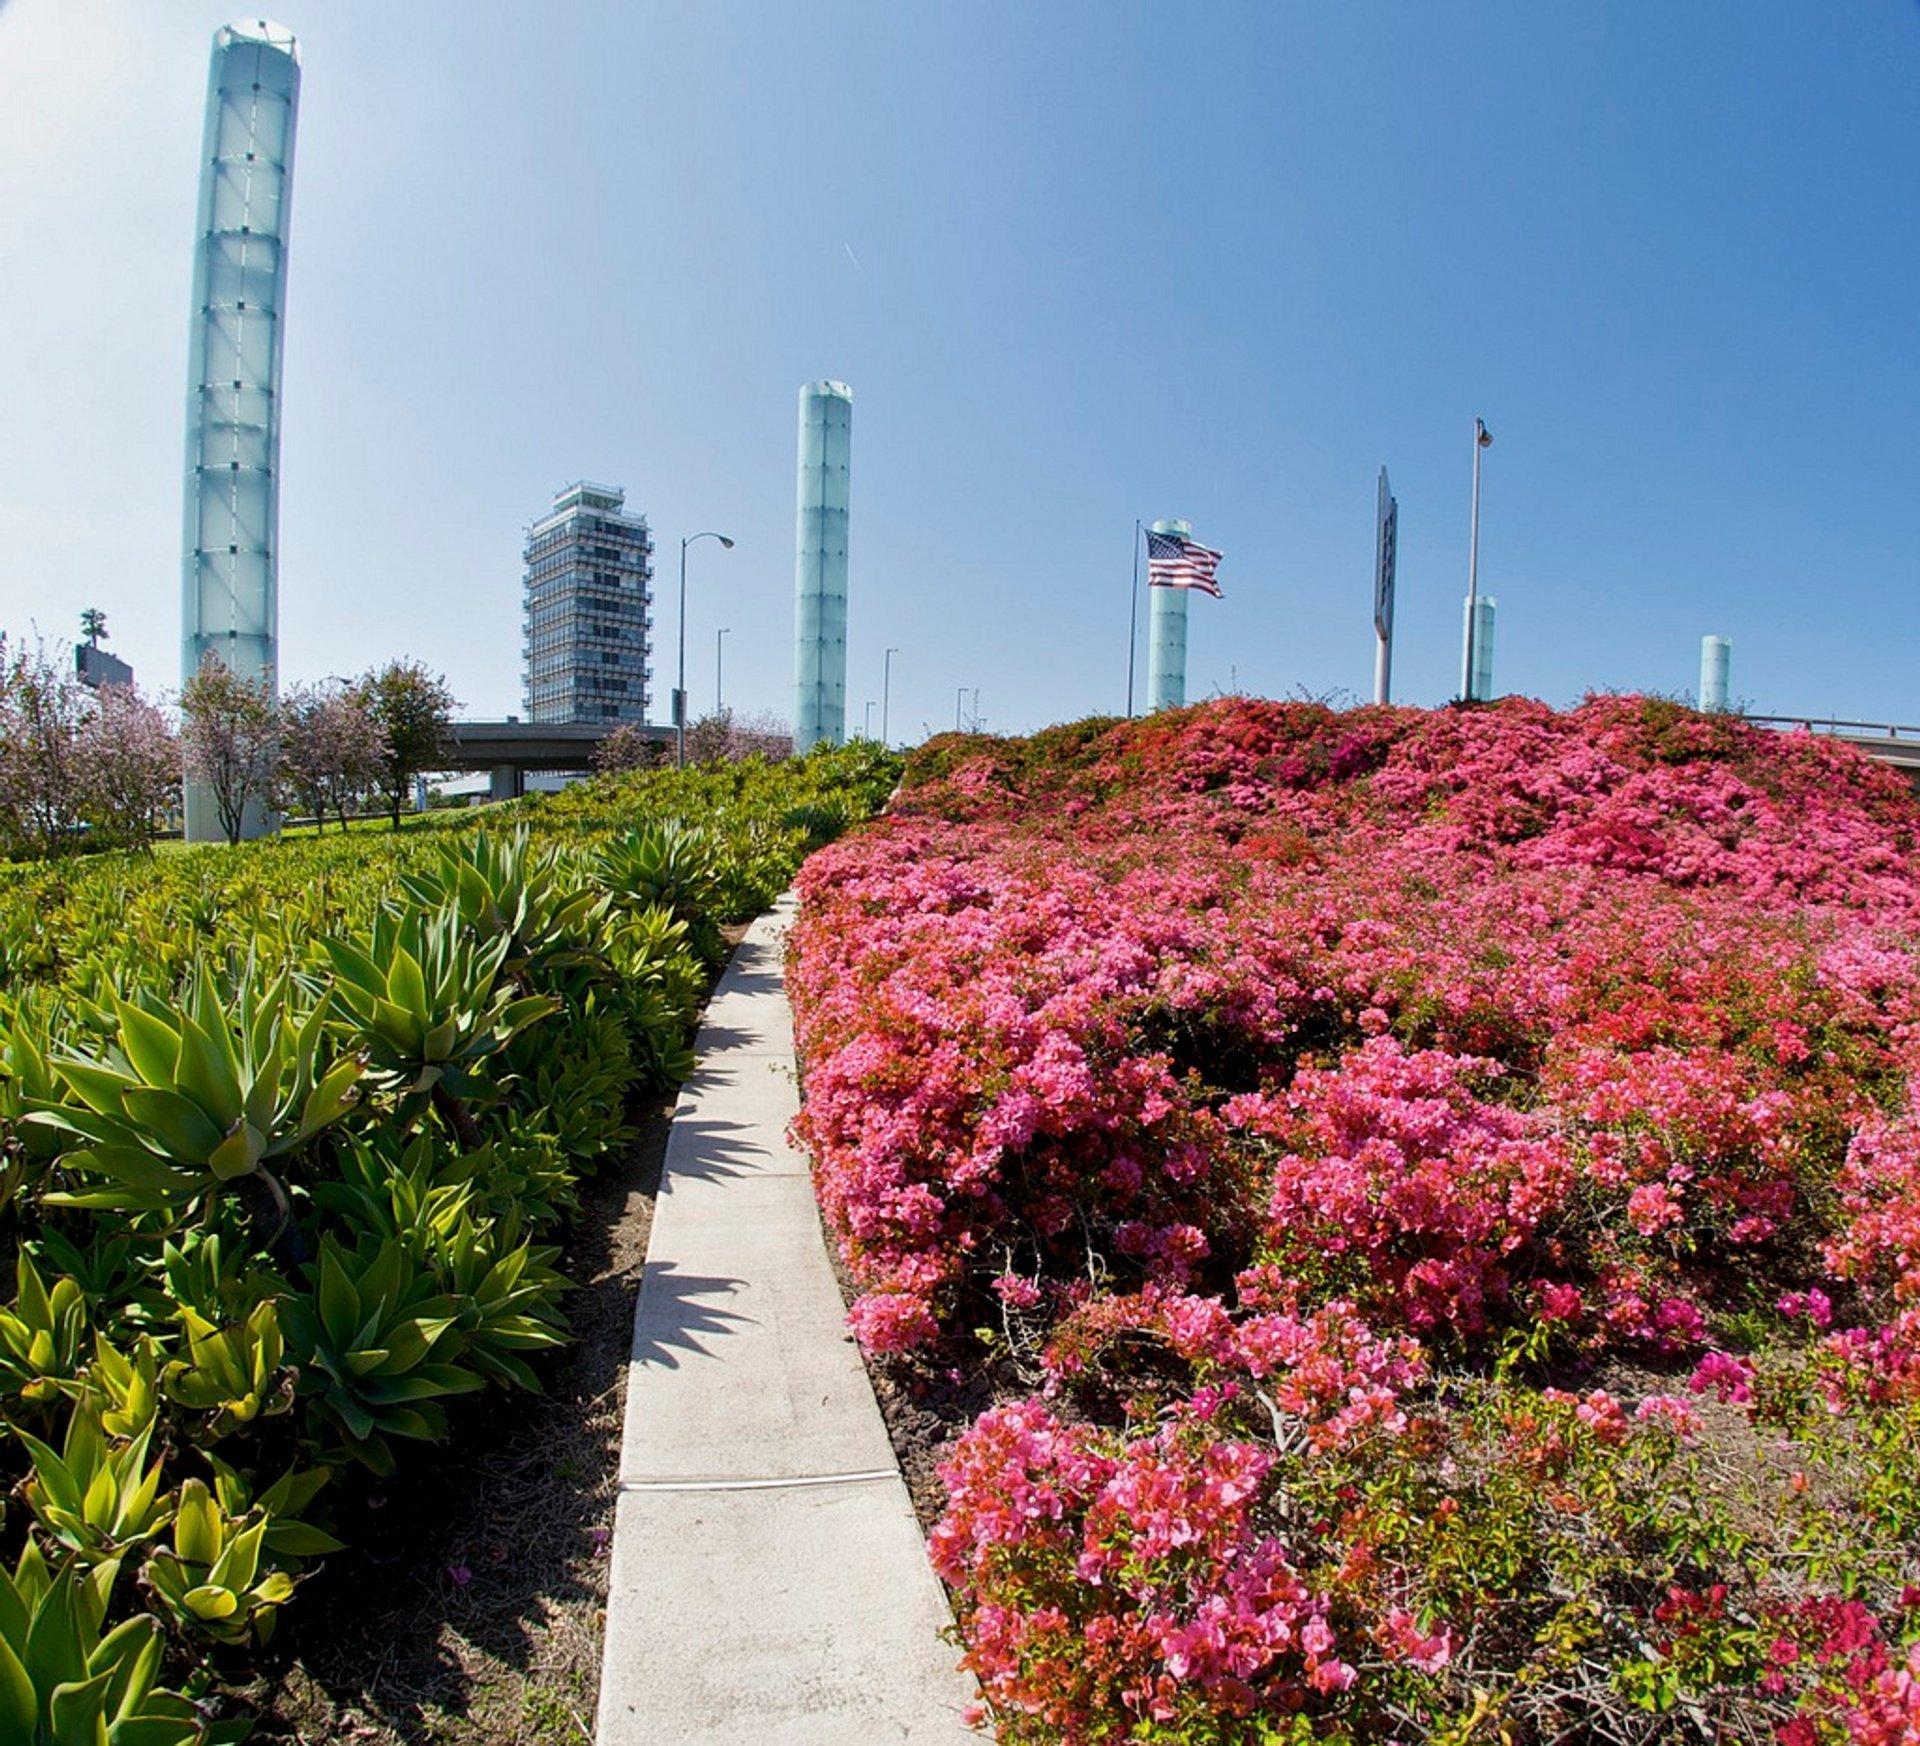 Bougainvillea Bloom in Los Angeles - Best Season 2020